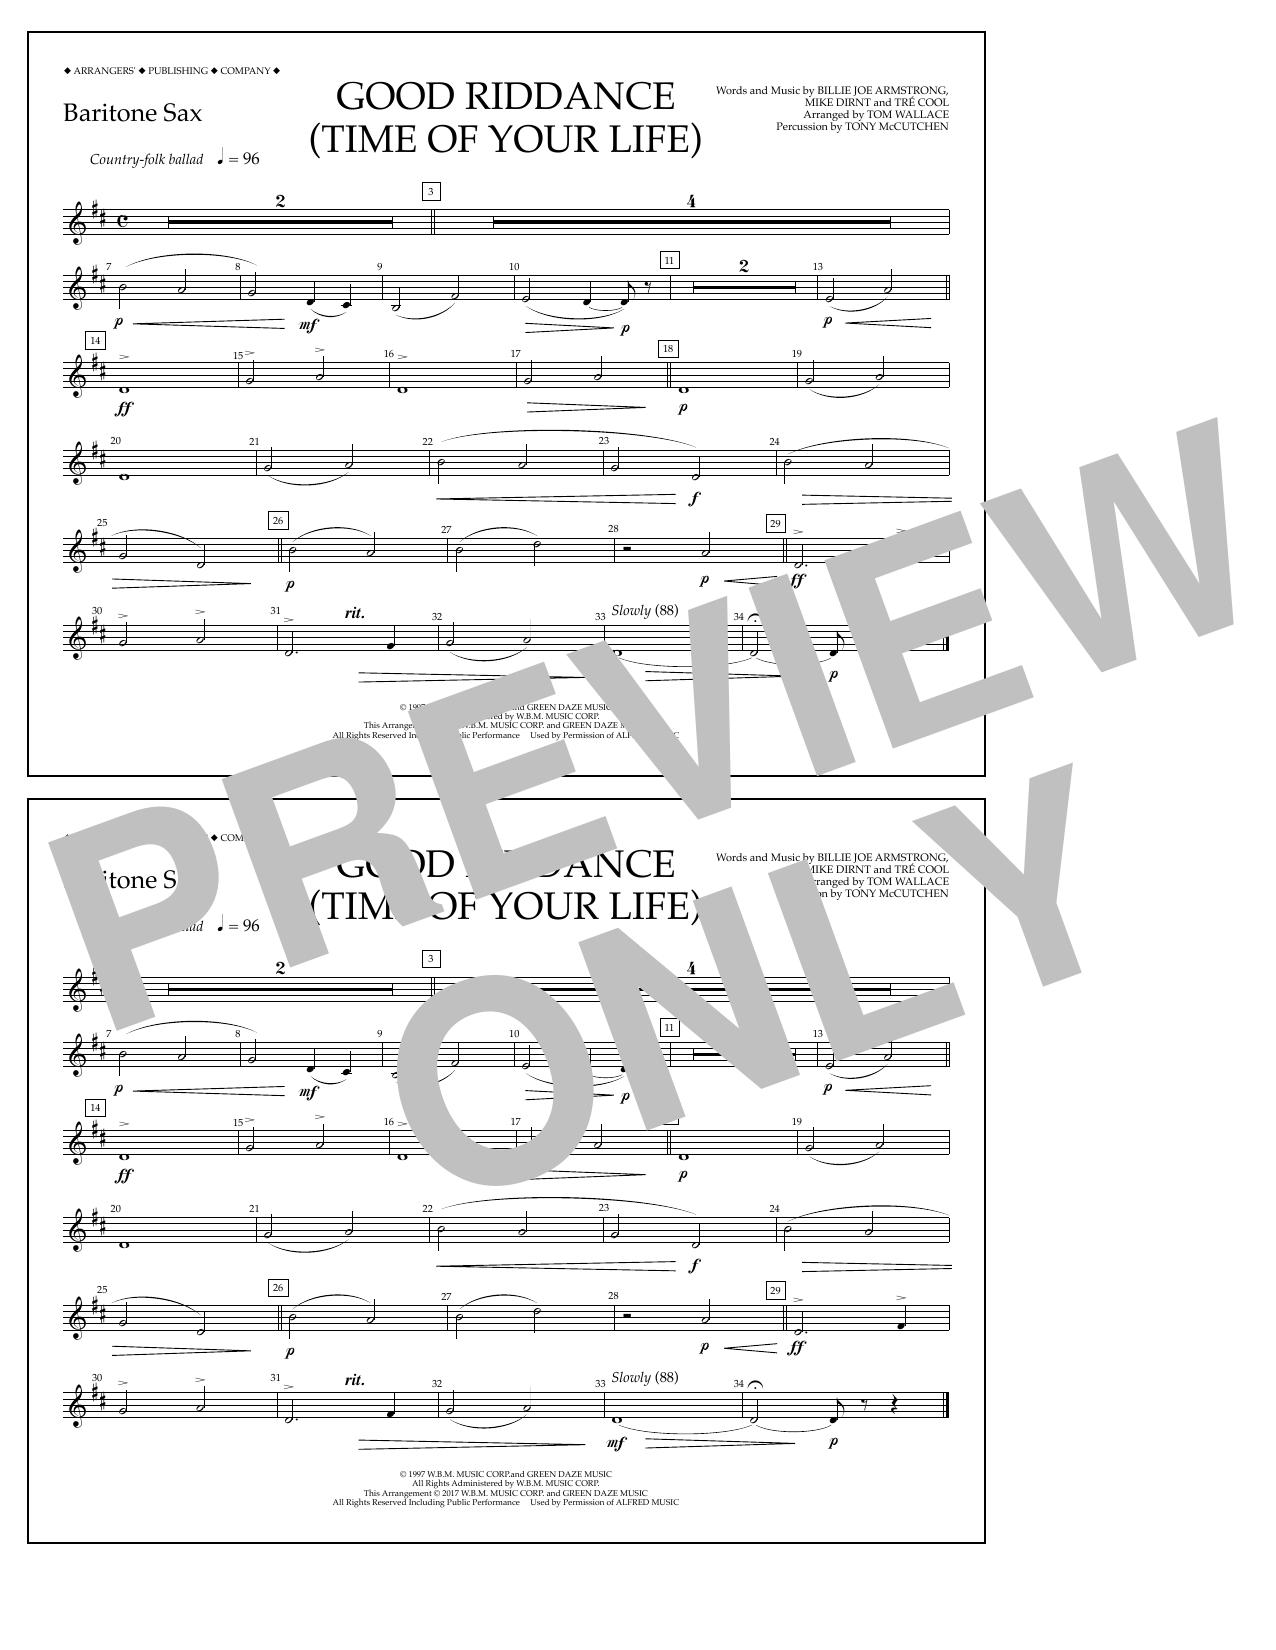 Good Riddance (Time of Your Life) - Baritone Sax Sheet Music